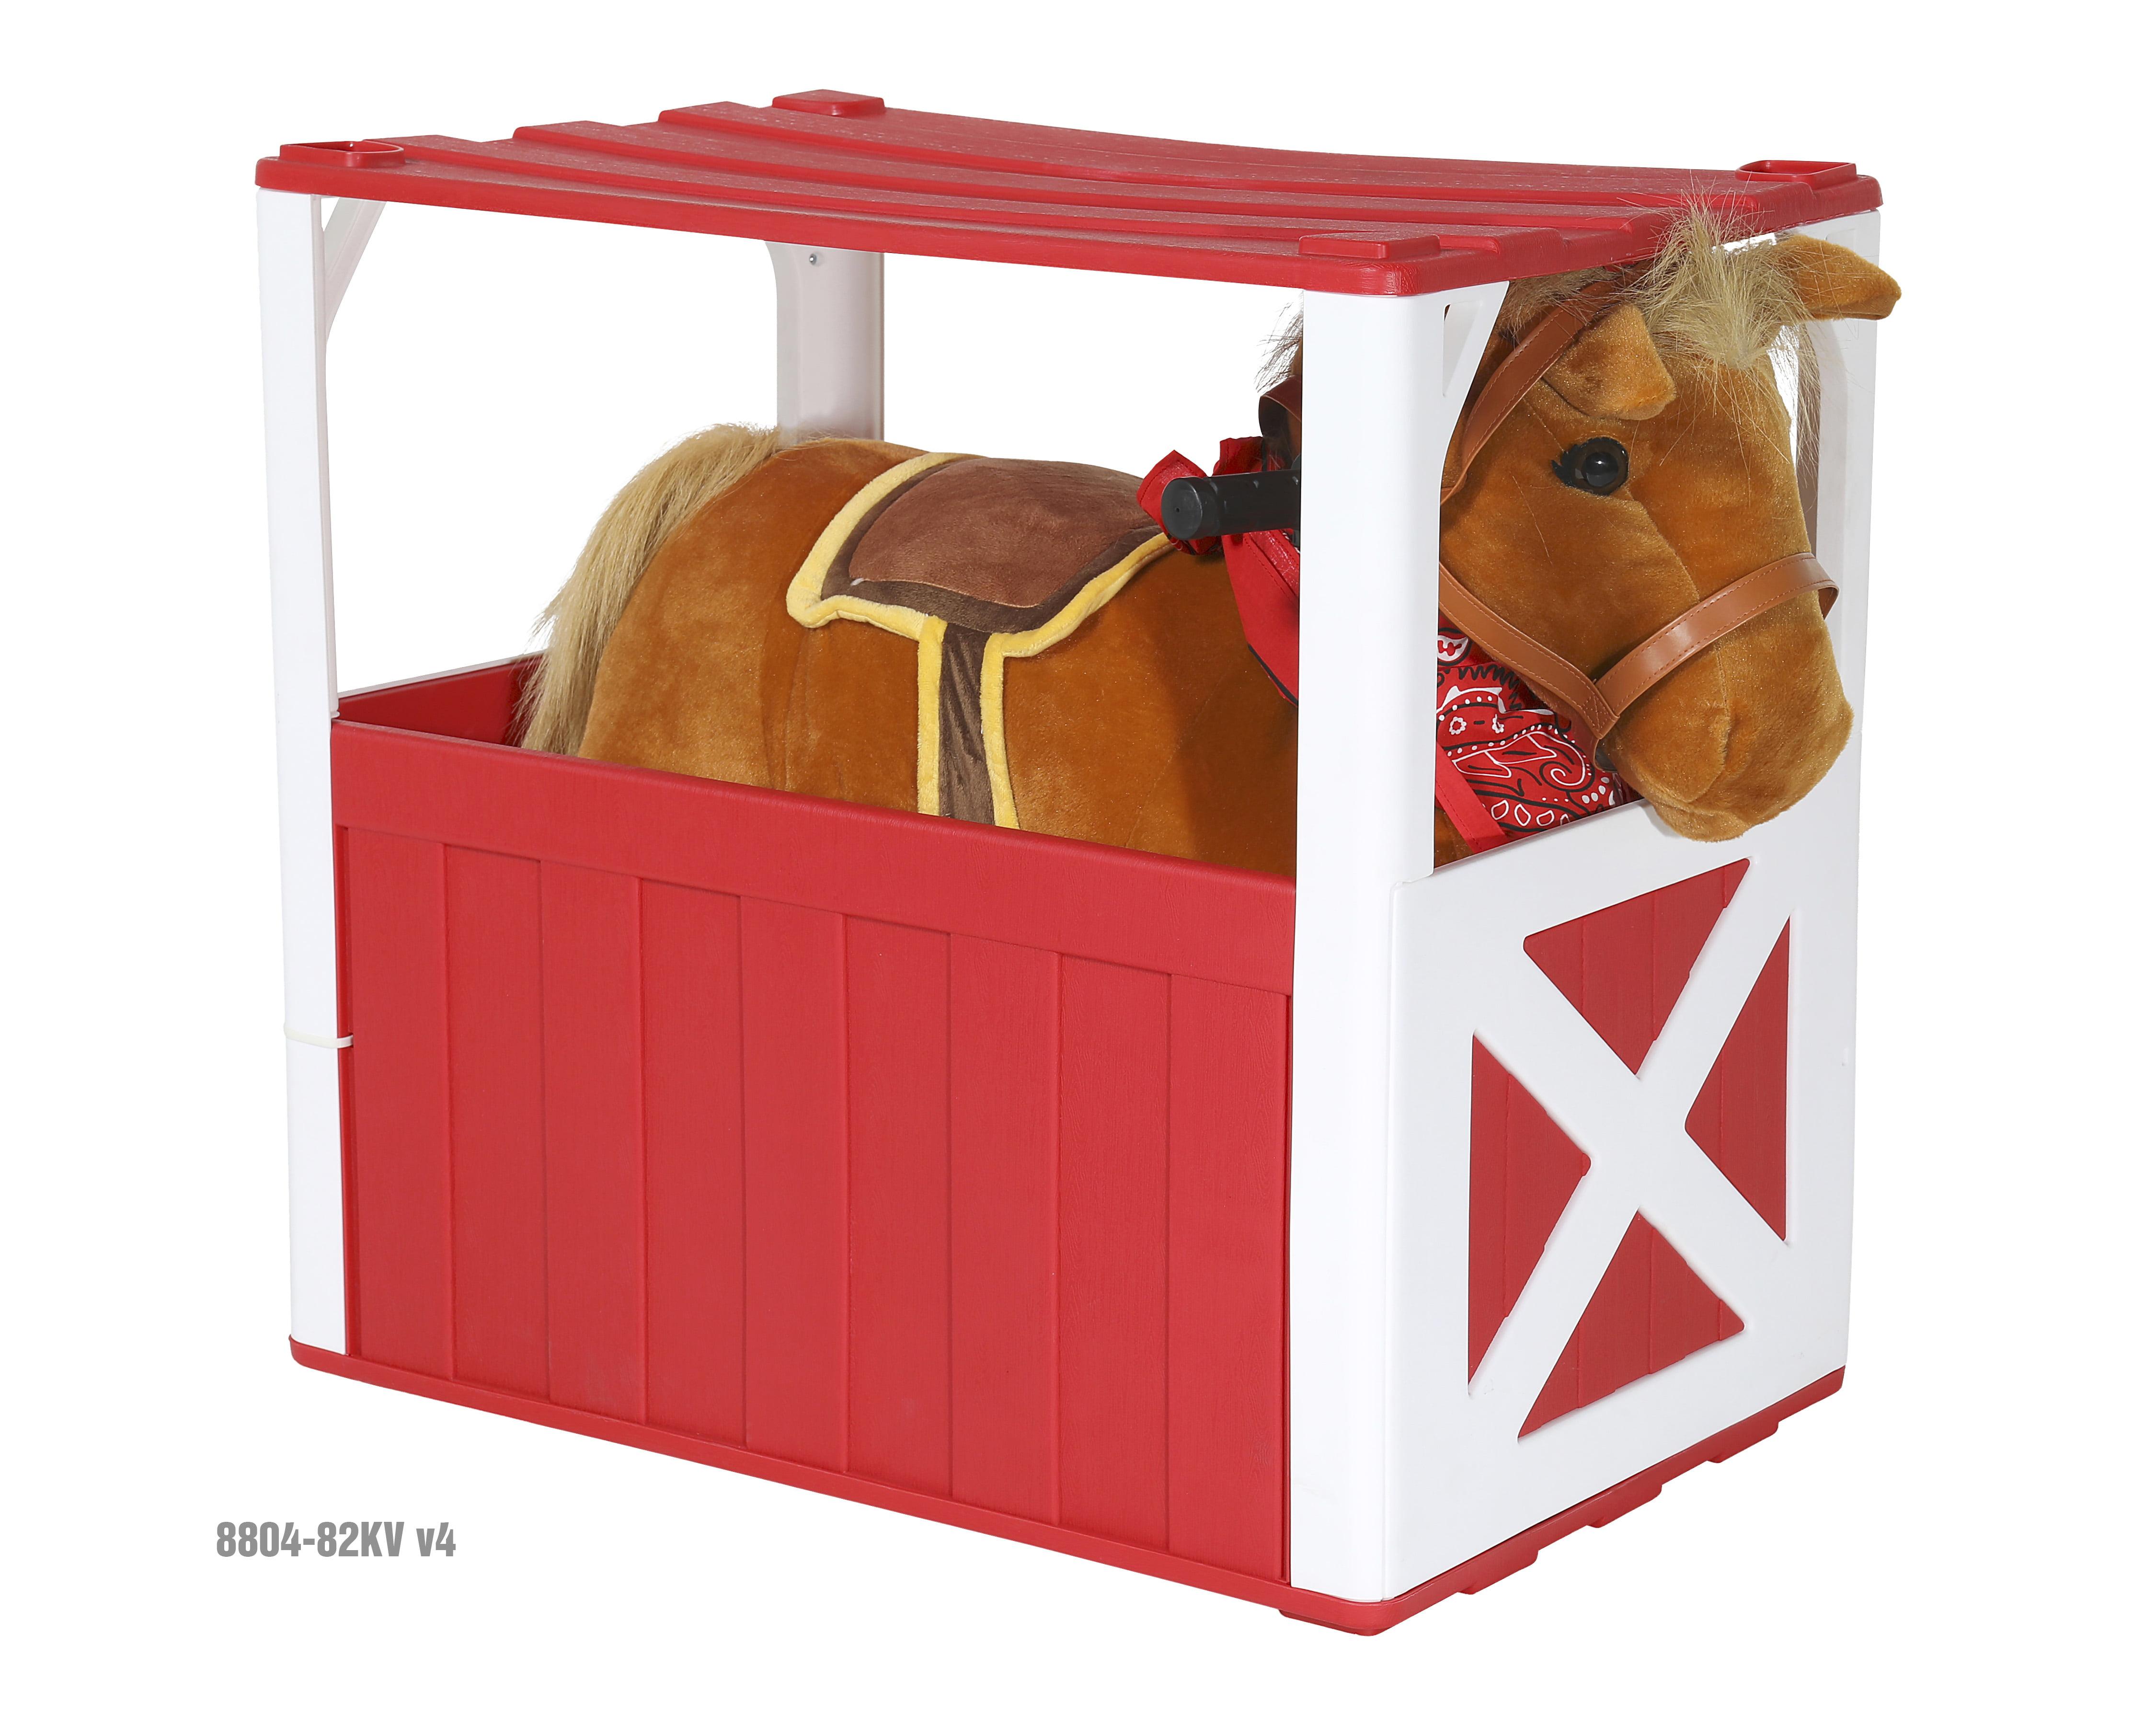 6 Volt Stable Buddies Chestnut Horse Plush Ride-On by Dynacraft